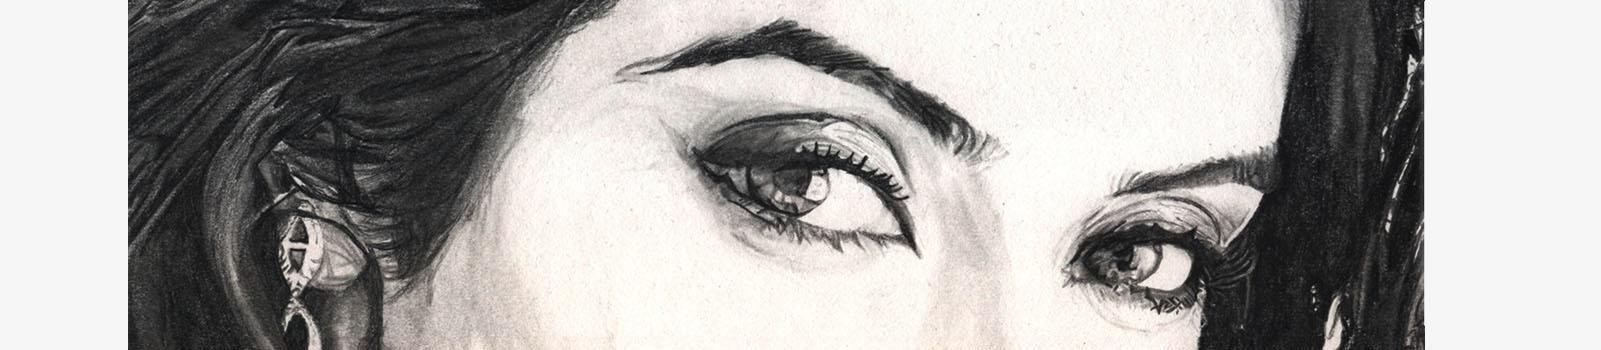 Portrait drawings for Tumblr drawings of eyes